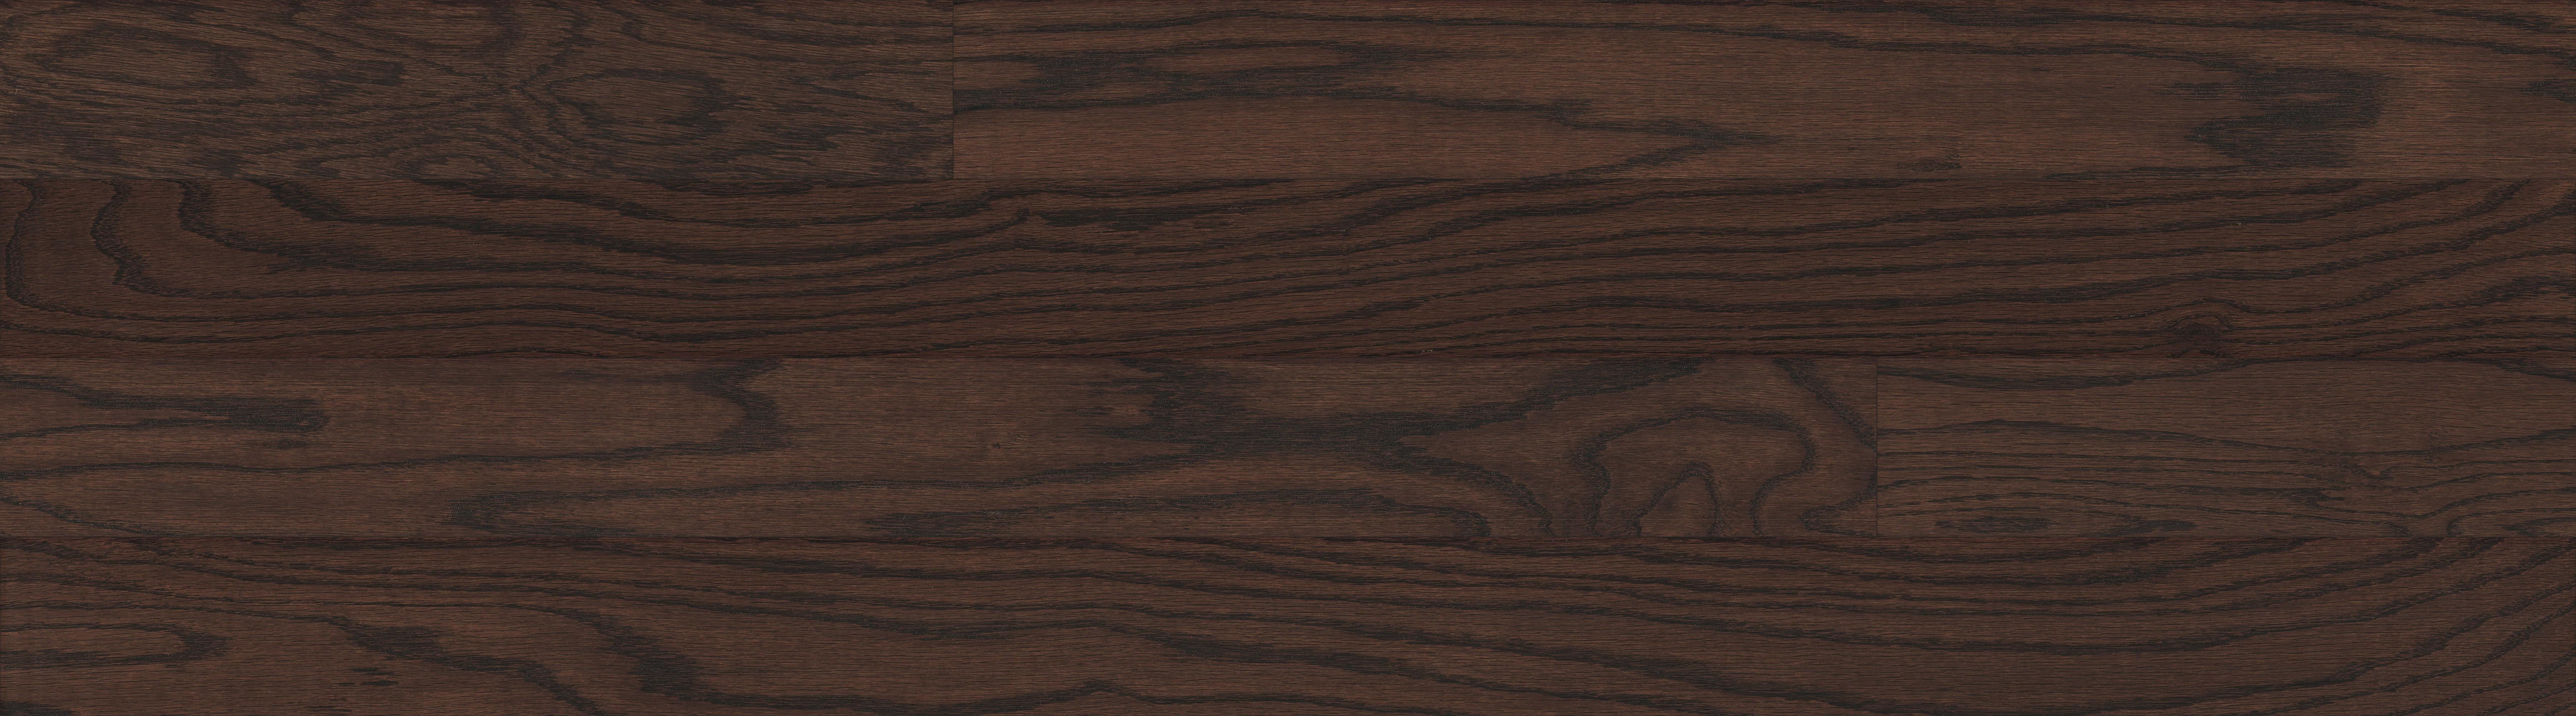 5 inch wide hickory hardwood flooring of mullican ridgecrest oak burnt umber 1 2 thick 5 wide engineered intended for mullican ridgecrest oak burnt umber 1 2 thick 5 wide engineered hardwood flooring